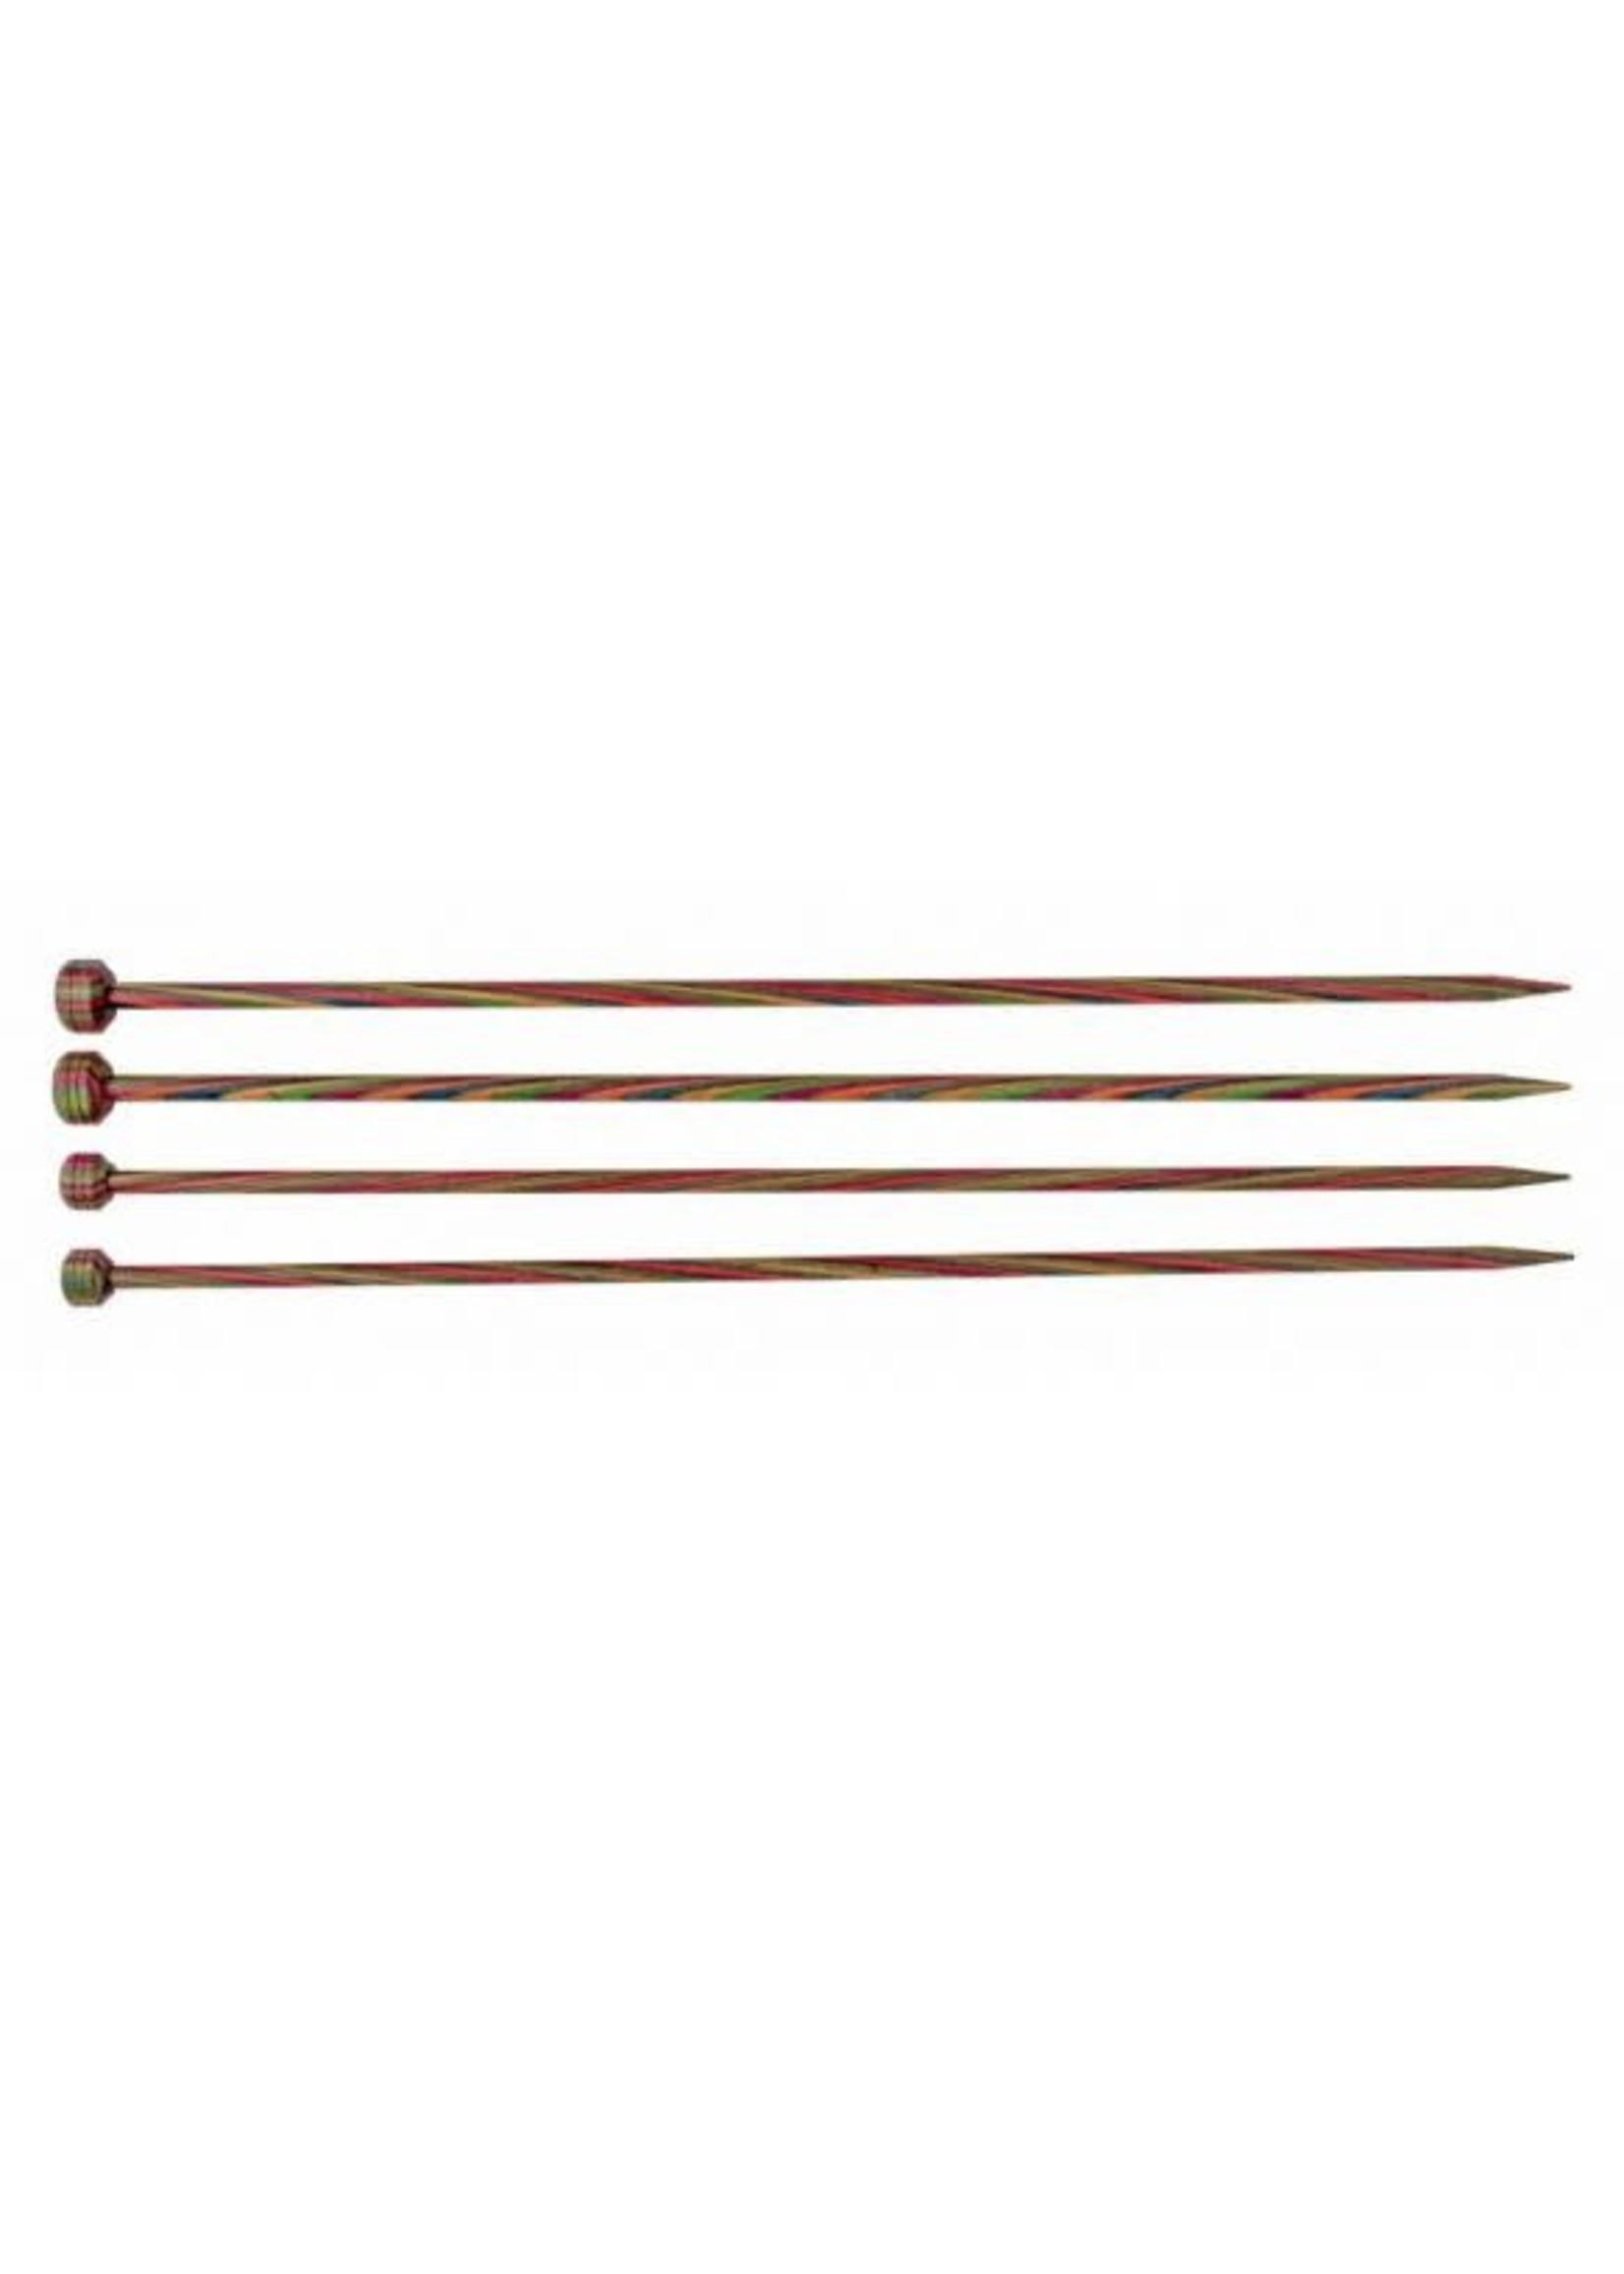 KnitPro Knitpro Symfonie Breinaalden 40cm met knop - 4.00mm